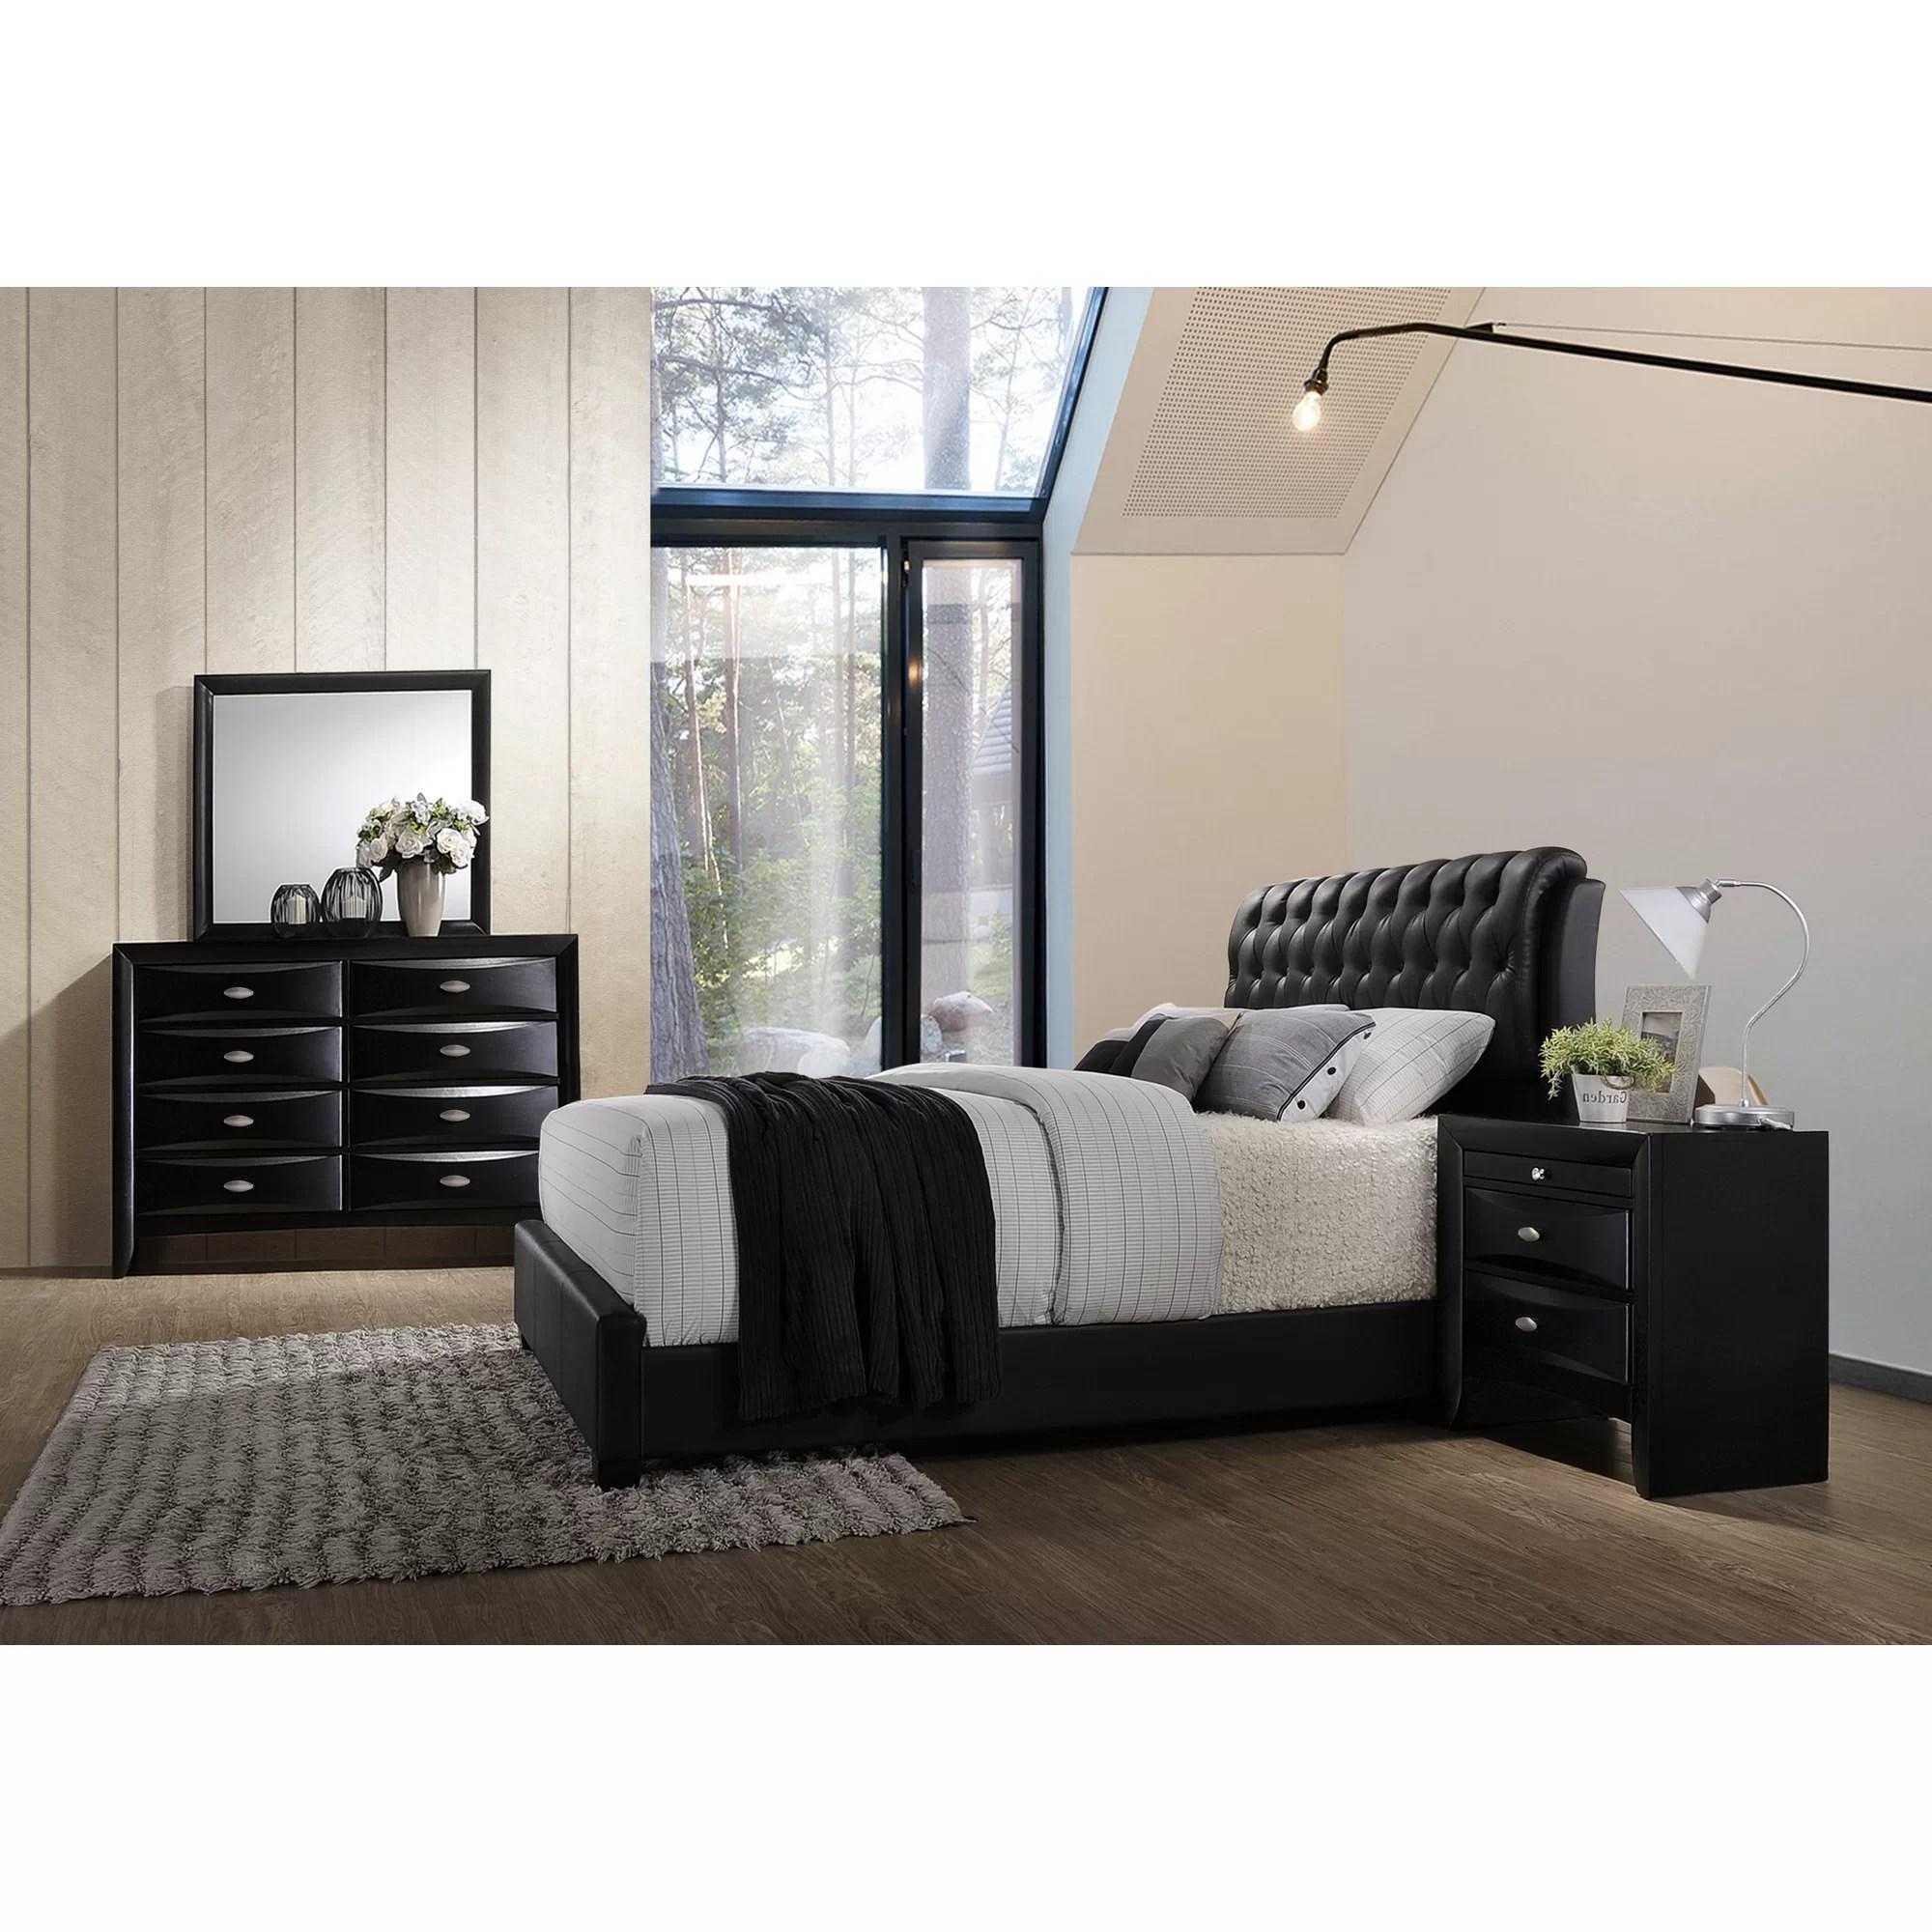 Furniture Bedroom